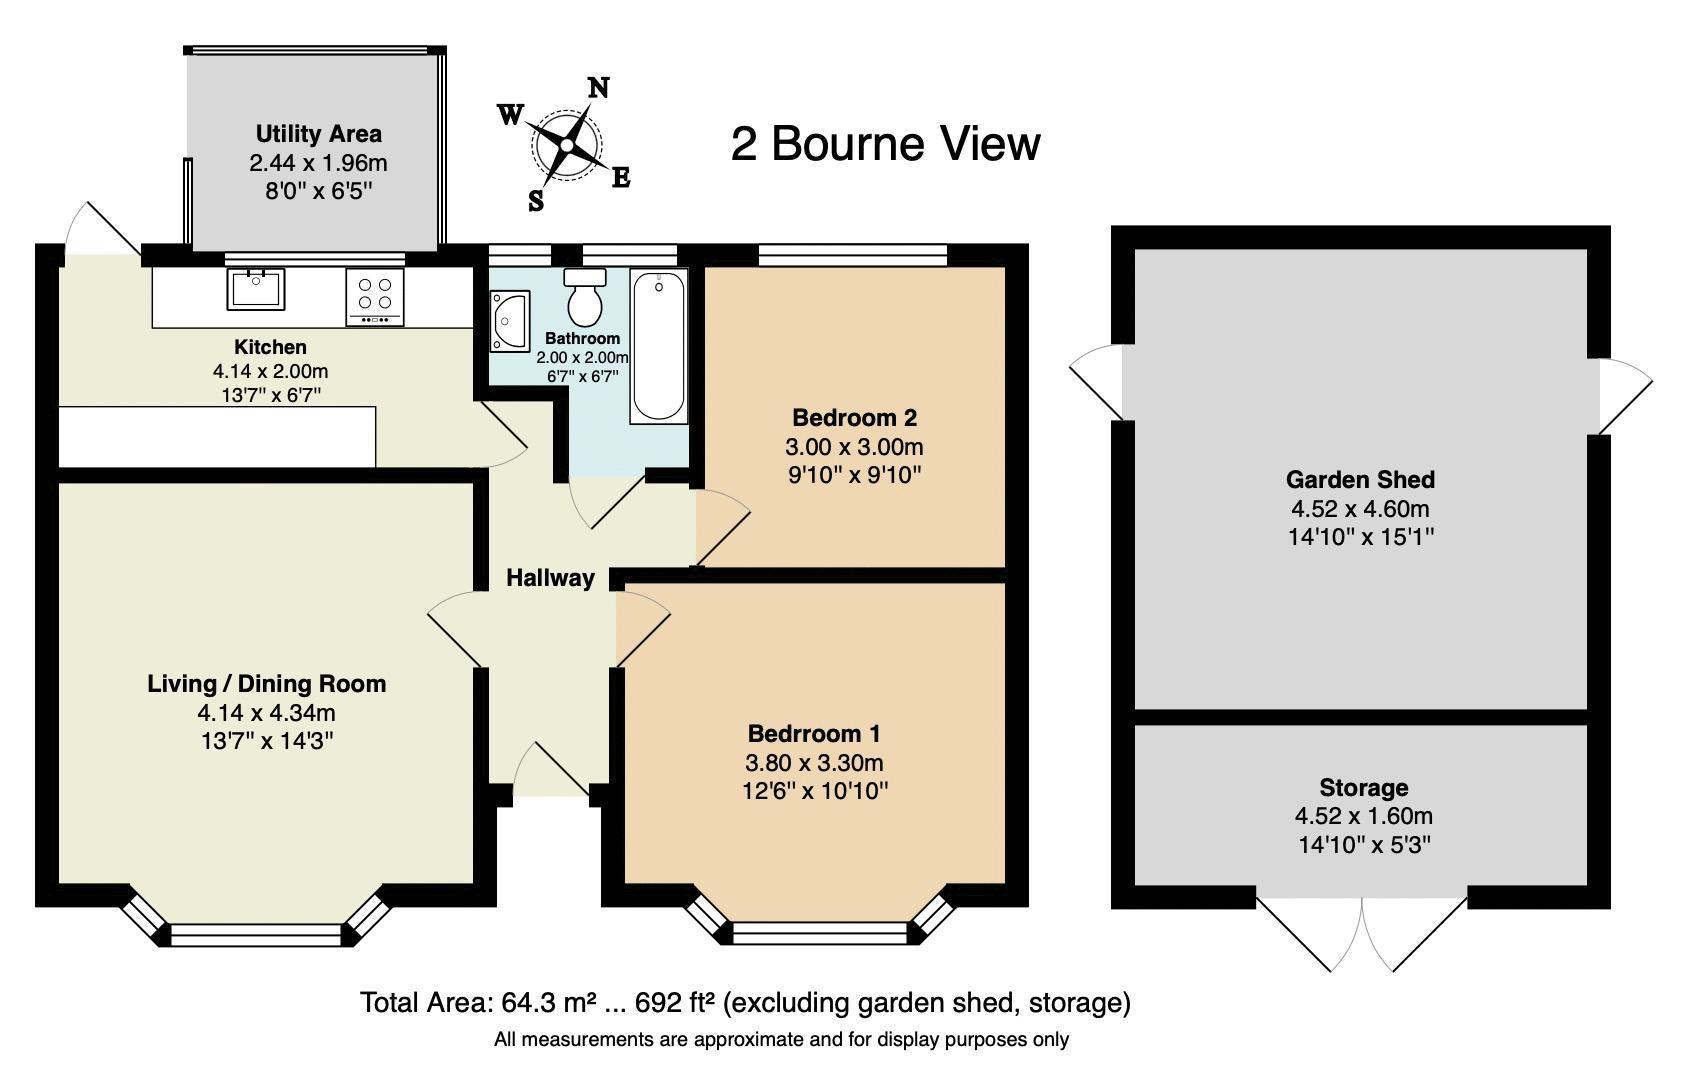 Bourne View